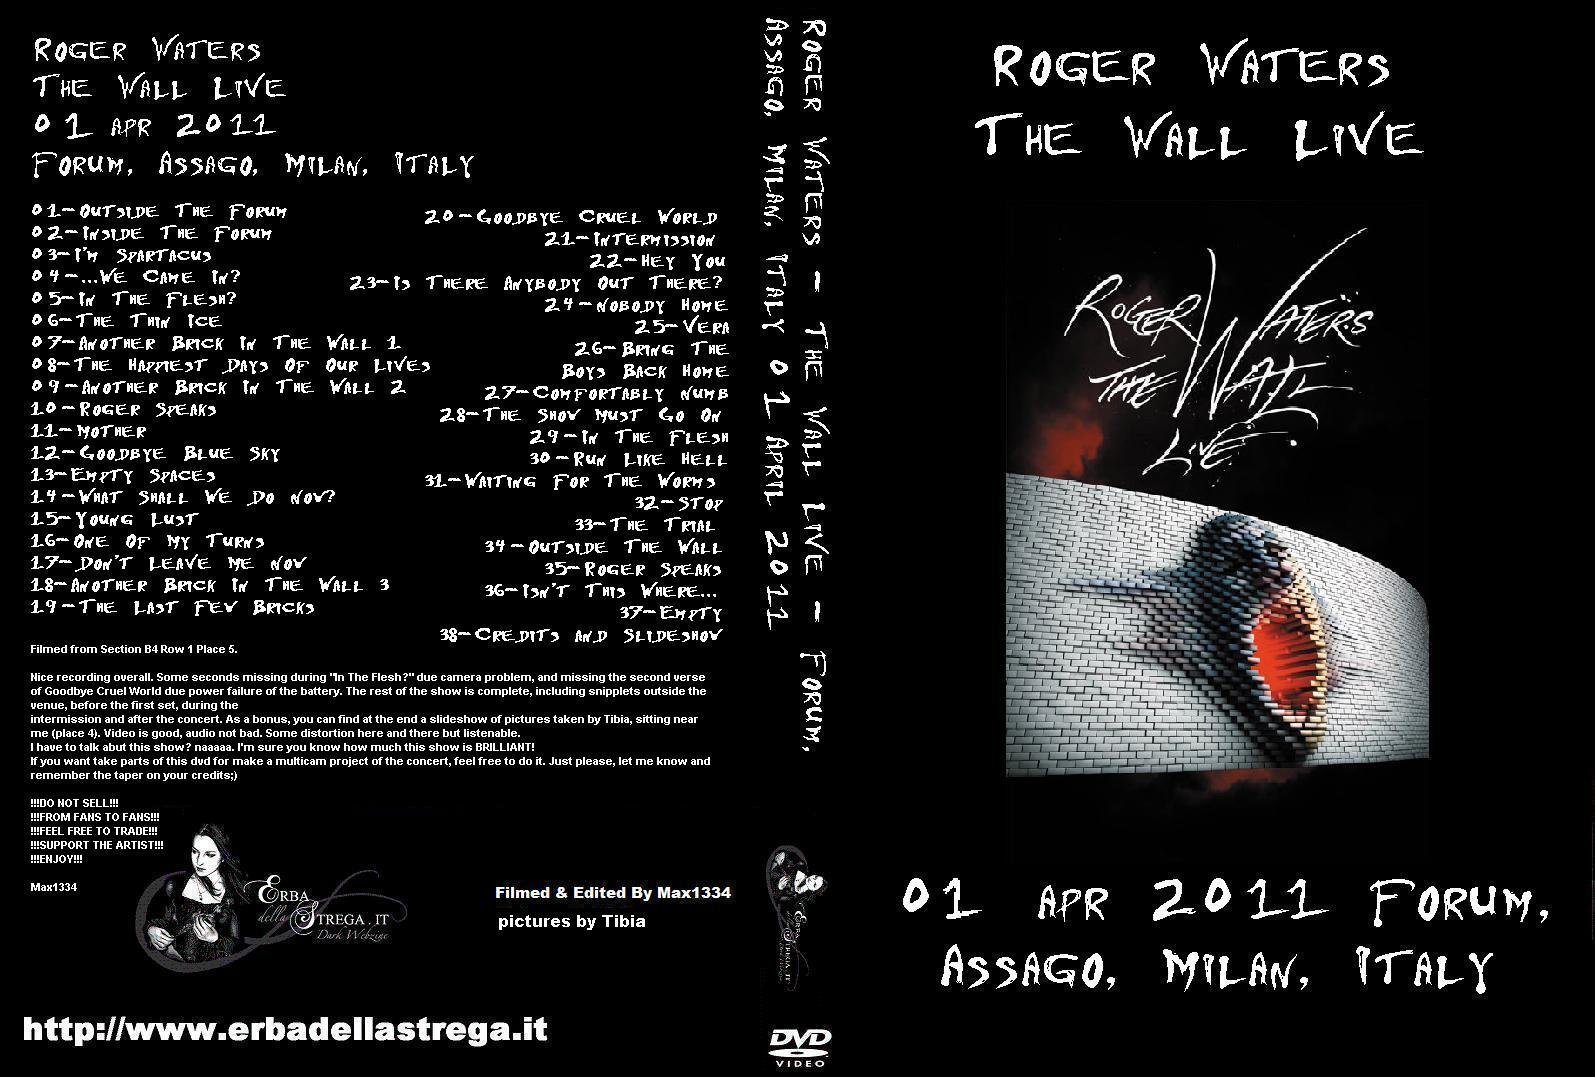 http://1.bp.blogspot.com/-avGKzueVaok/Tai4tTNgvMI/AAAAAAAAChg/oiYUWjSYsJE/s1600/DVD+Cover+-+2011-04-01+-+Roger+Waters+-+The+Wall+Live+-+Forum%252C+Assago%252C+Milan%252C+Italy.JPG